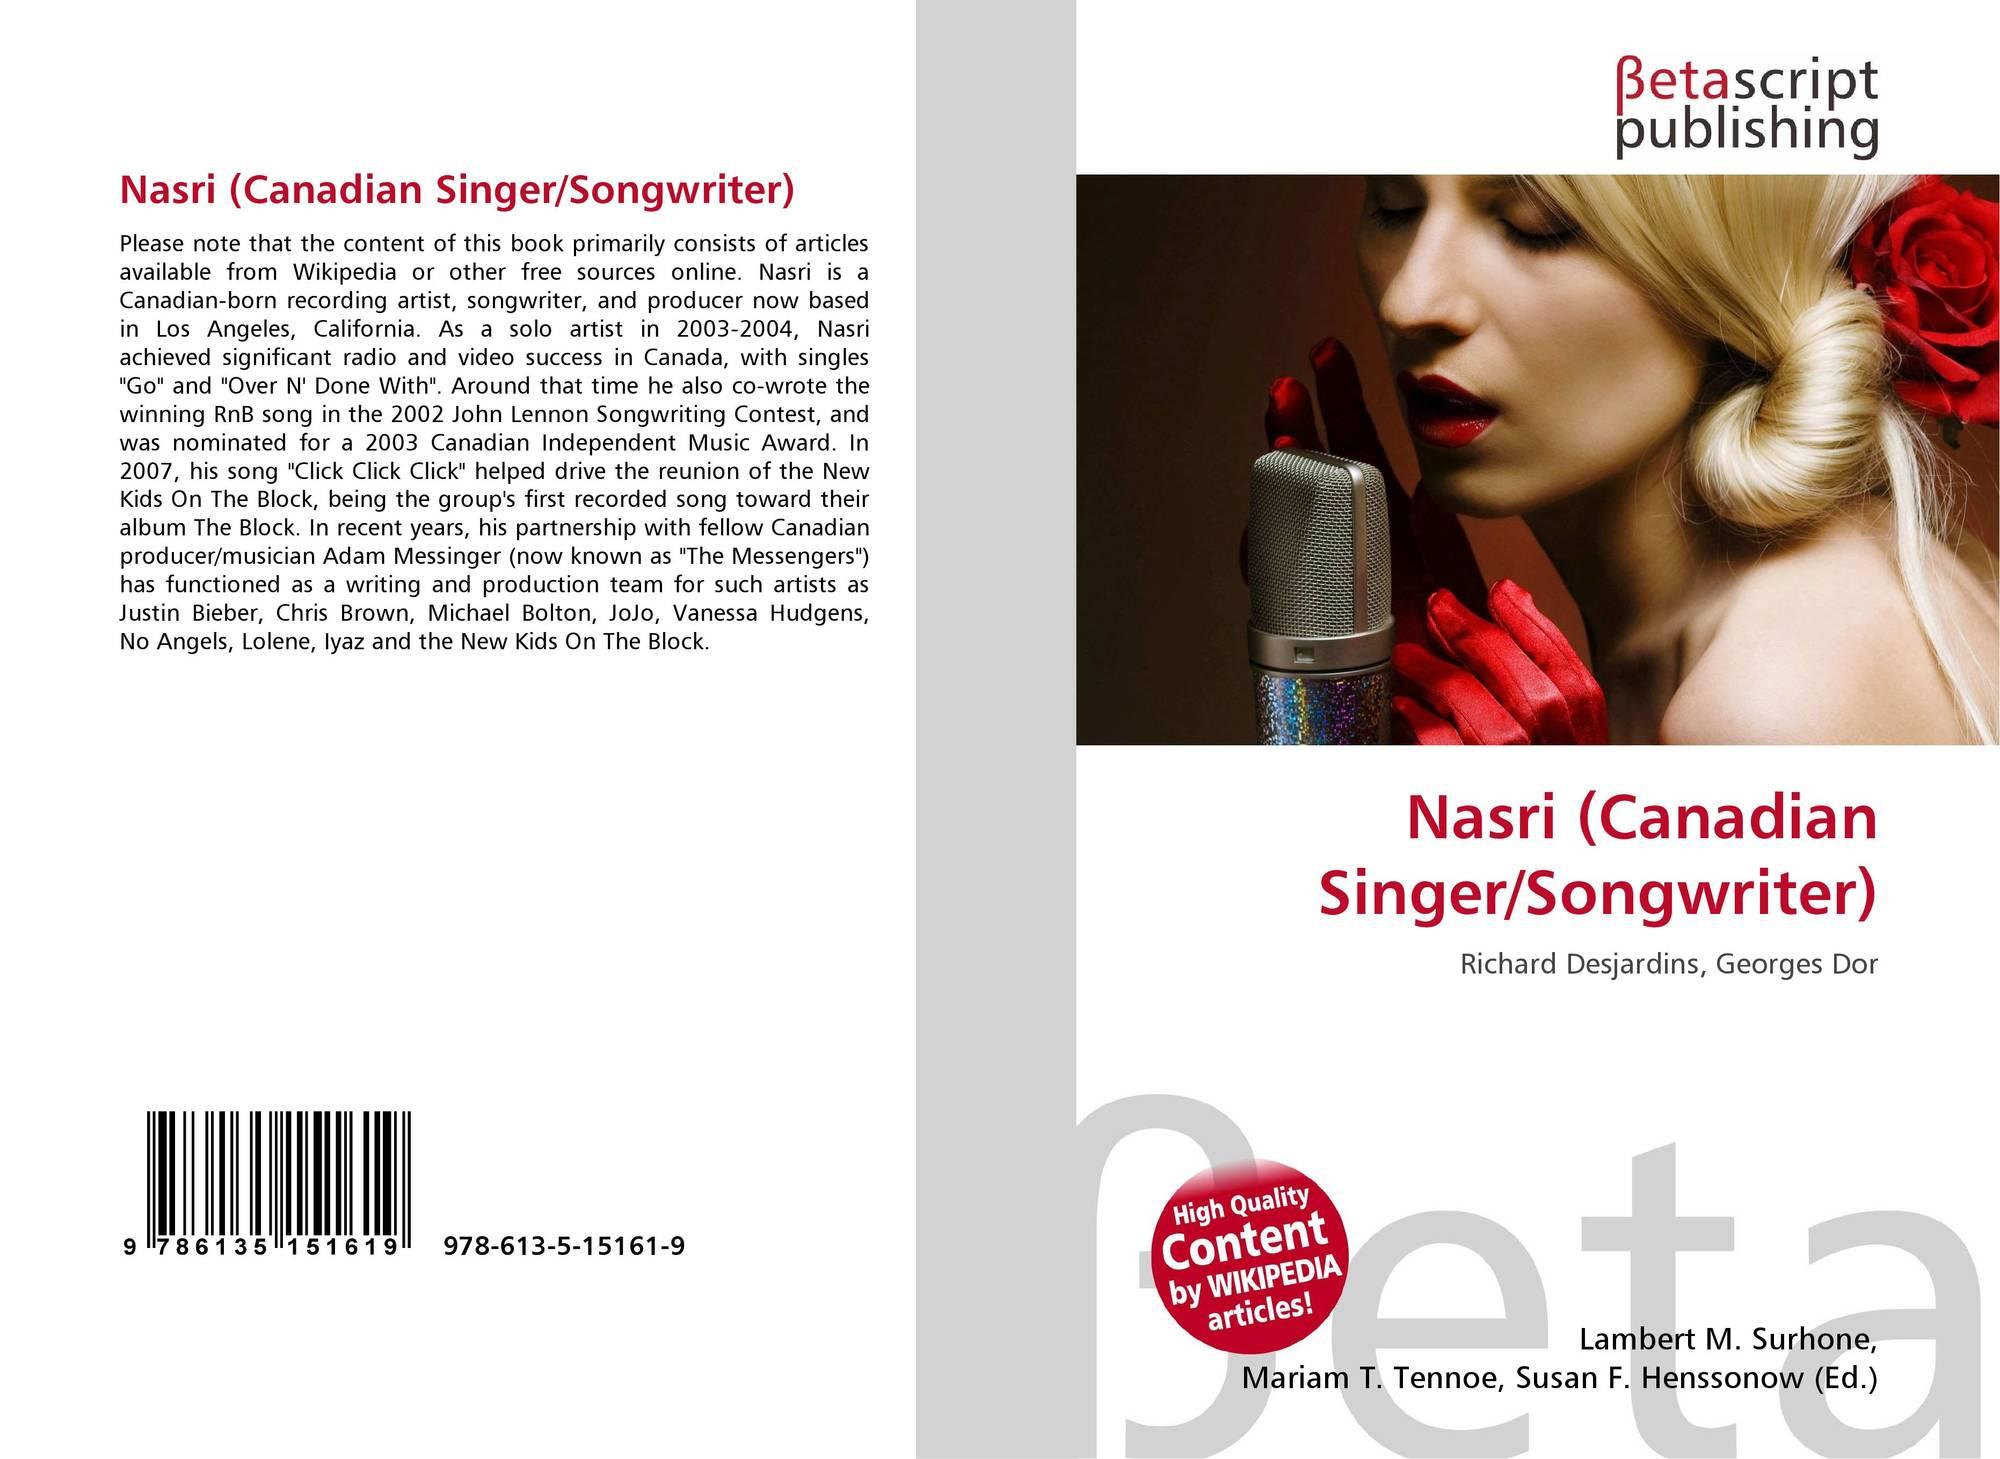 Nasri Songwriter